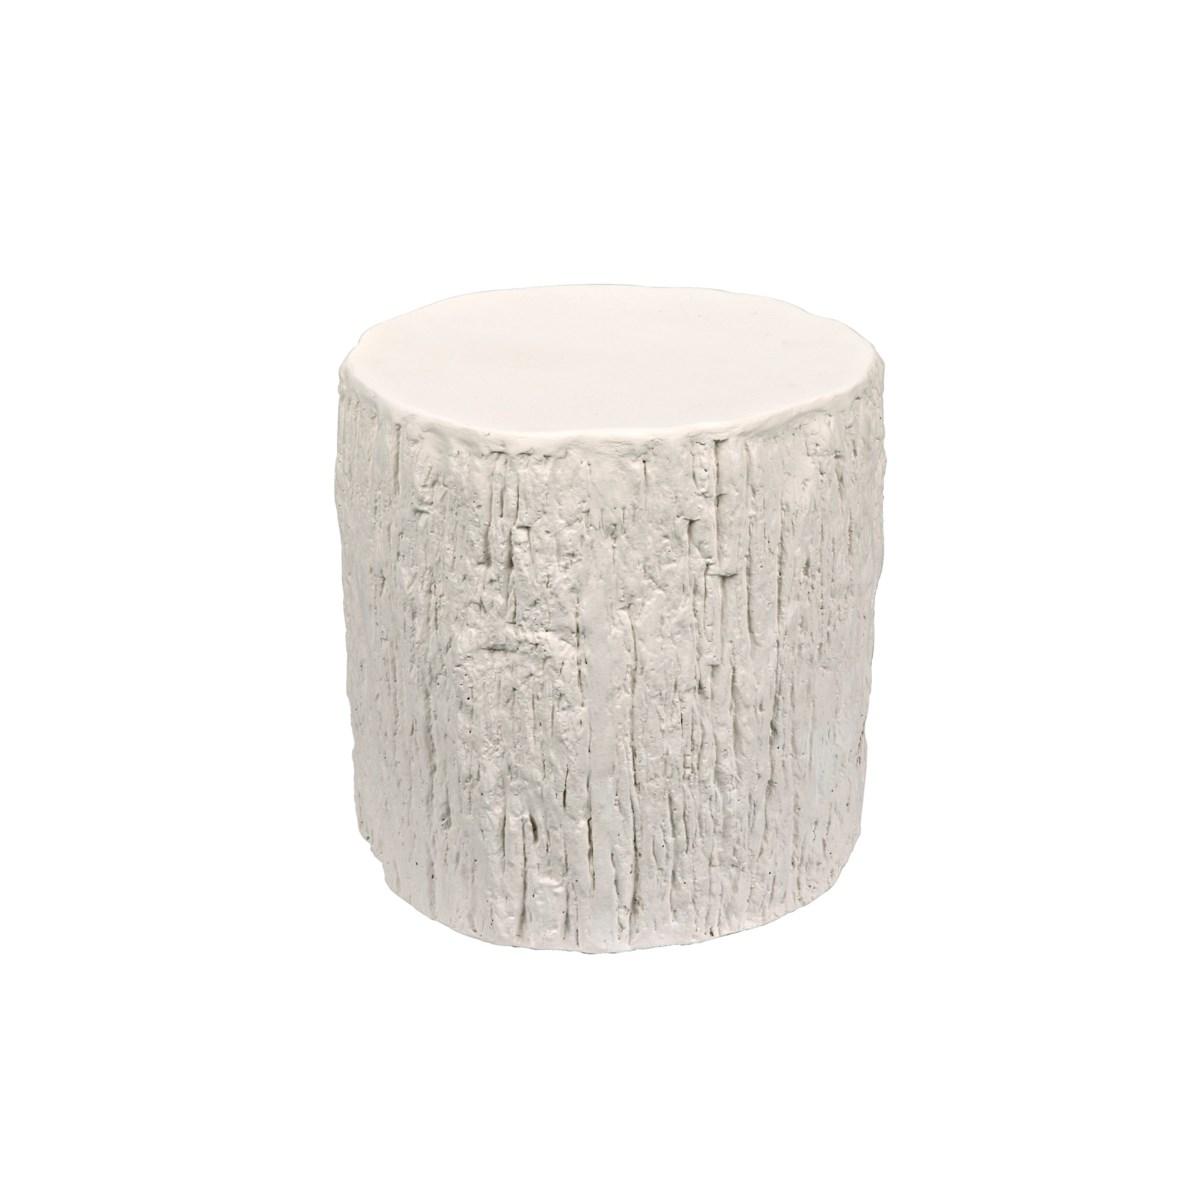 Trunk Side Table, White Fiber Cement